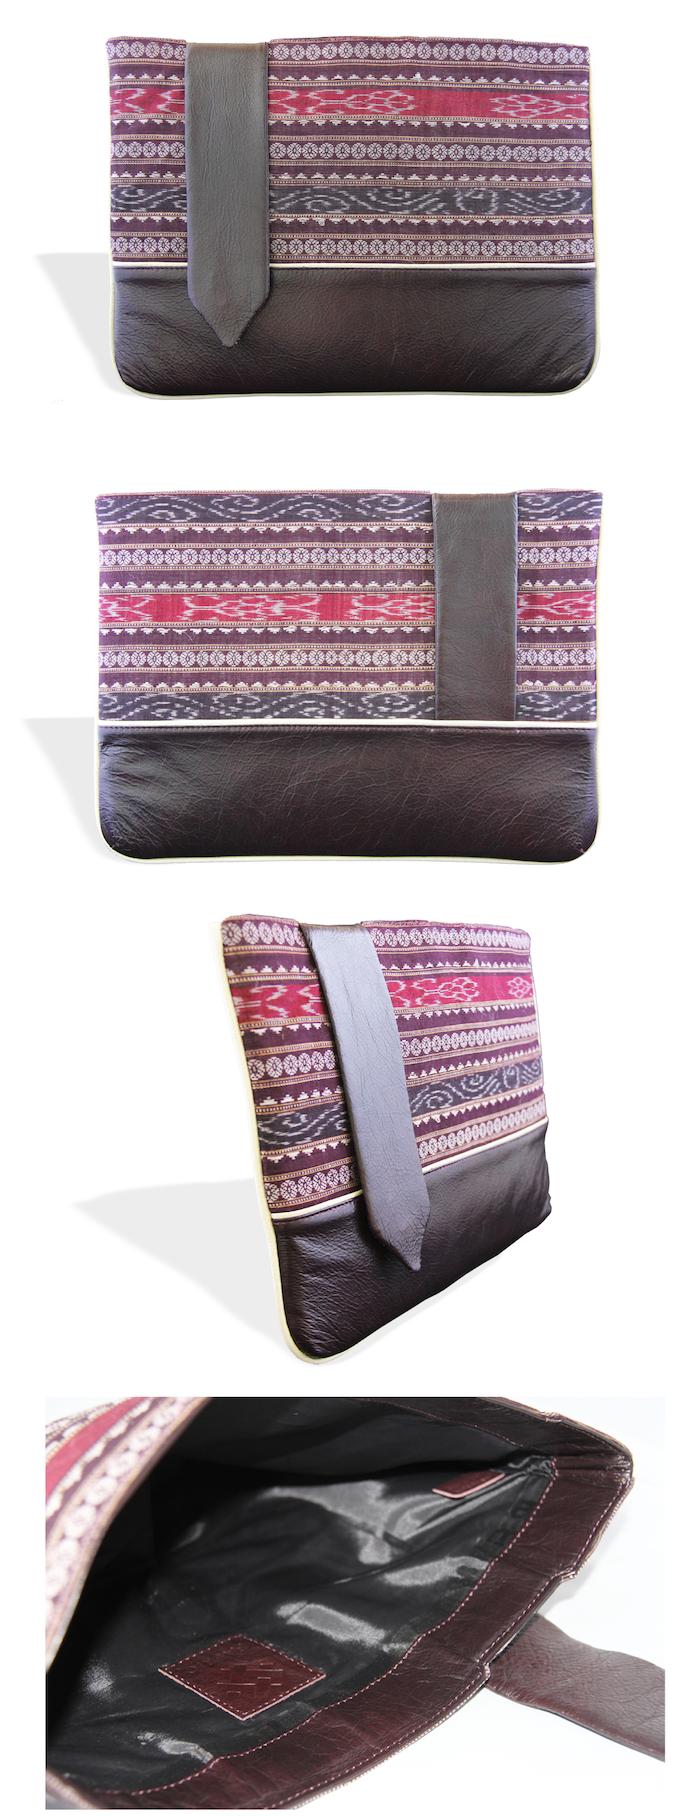 The Shakti Laptop Sleeve in Burgundy ikat with burgundy leather trim